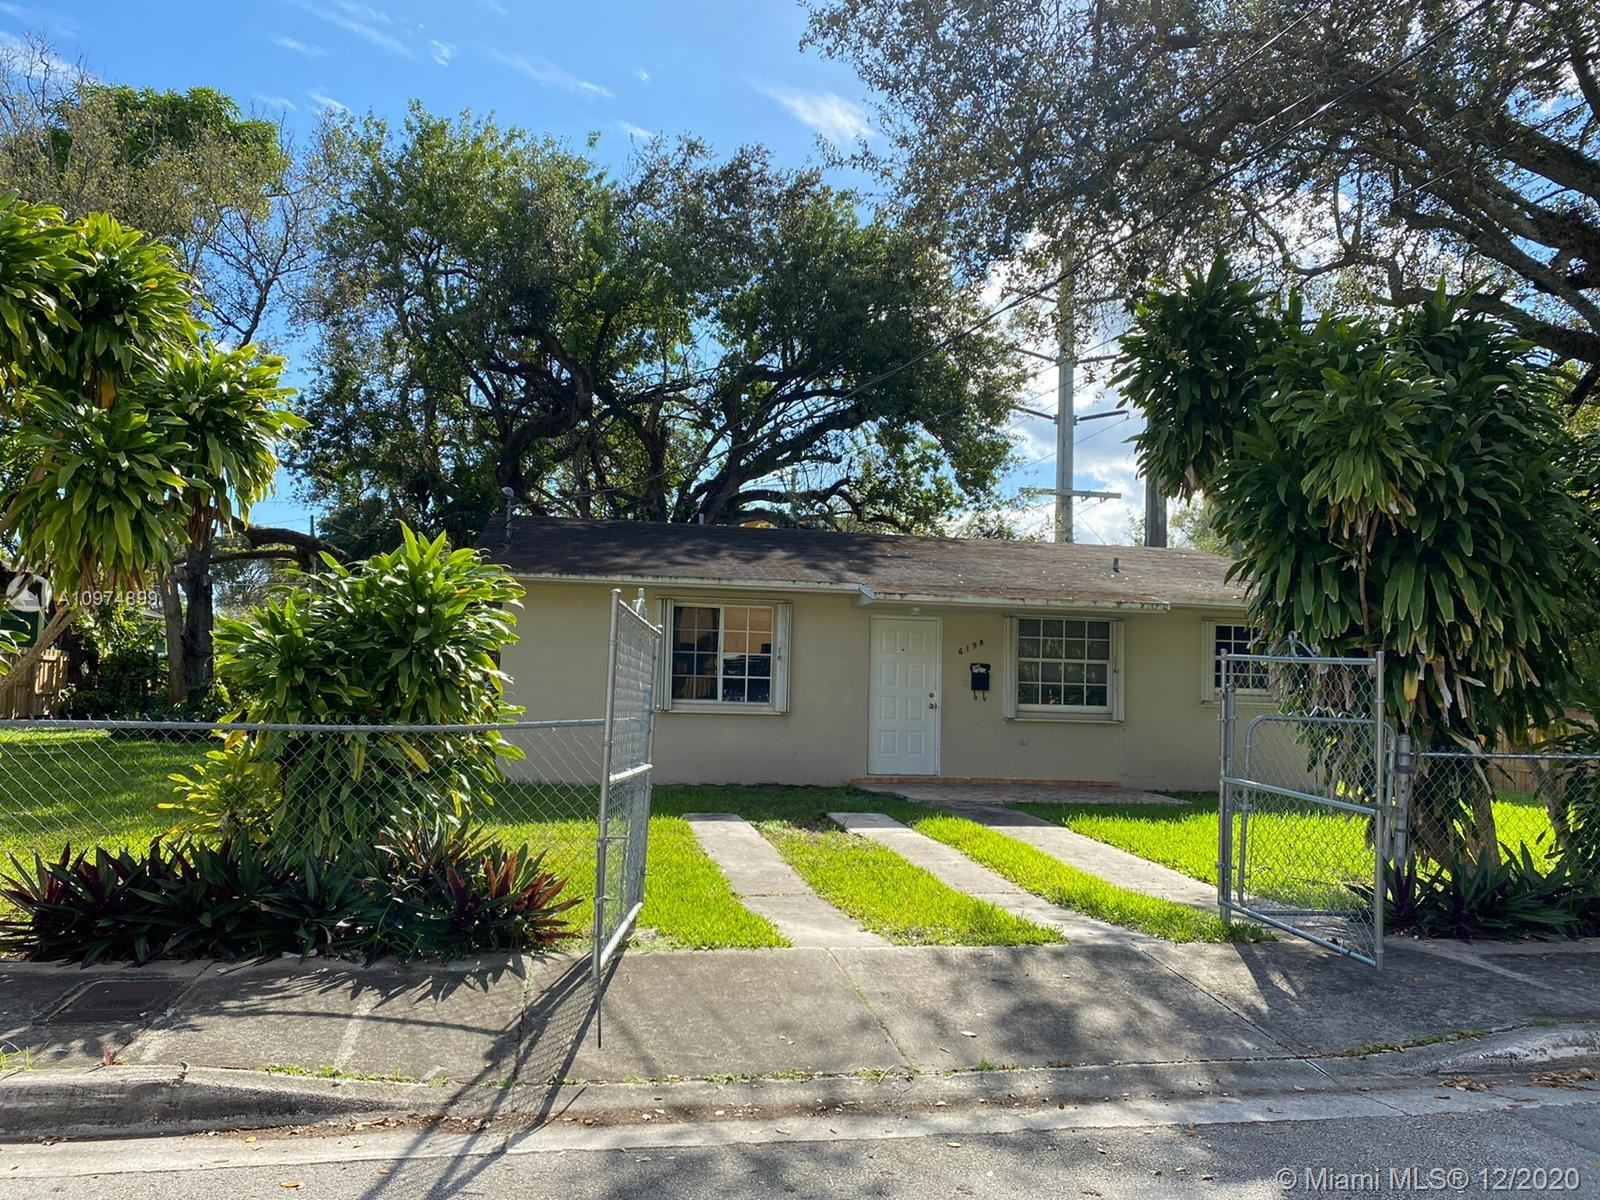 6198 SW 63rd St, South Miami, FL 33143 - #: A10974899